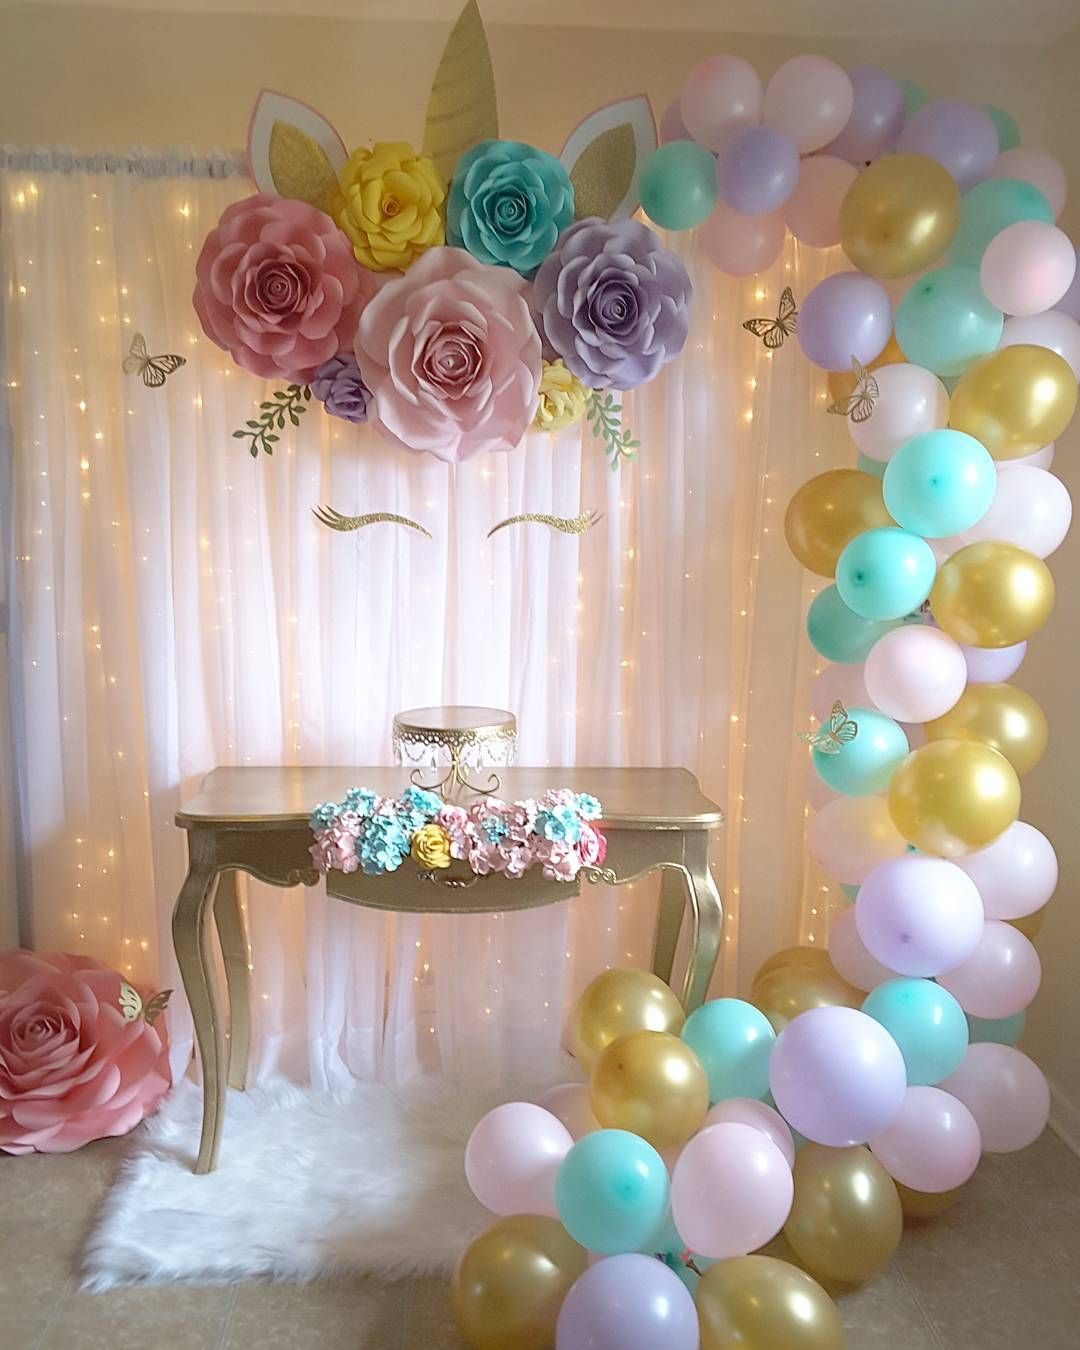 Flower Shower Di Instagram Mi Unicornio Paperflowers